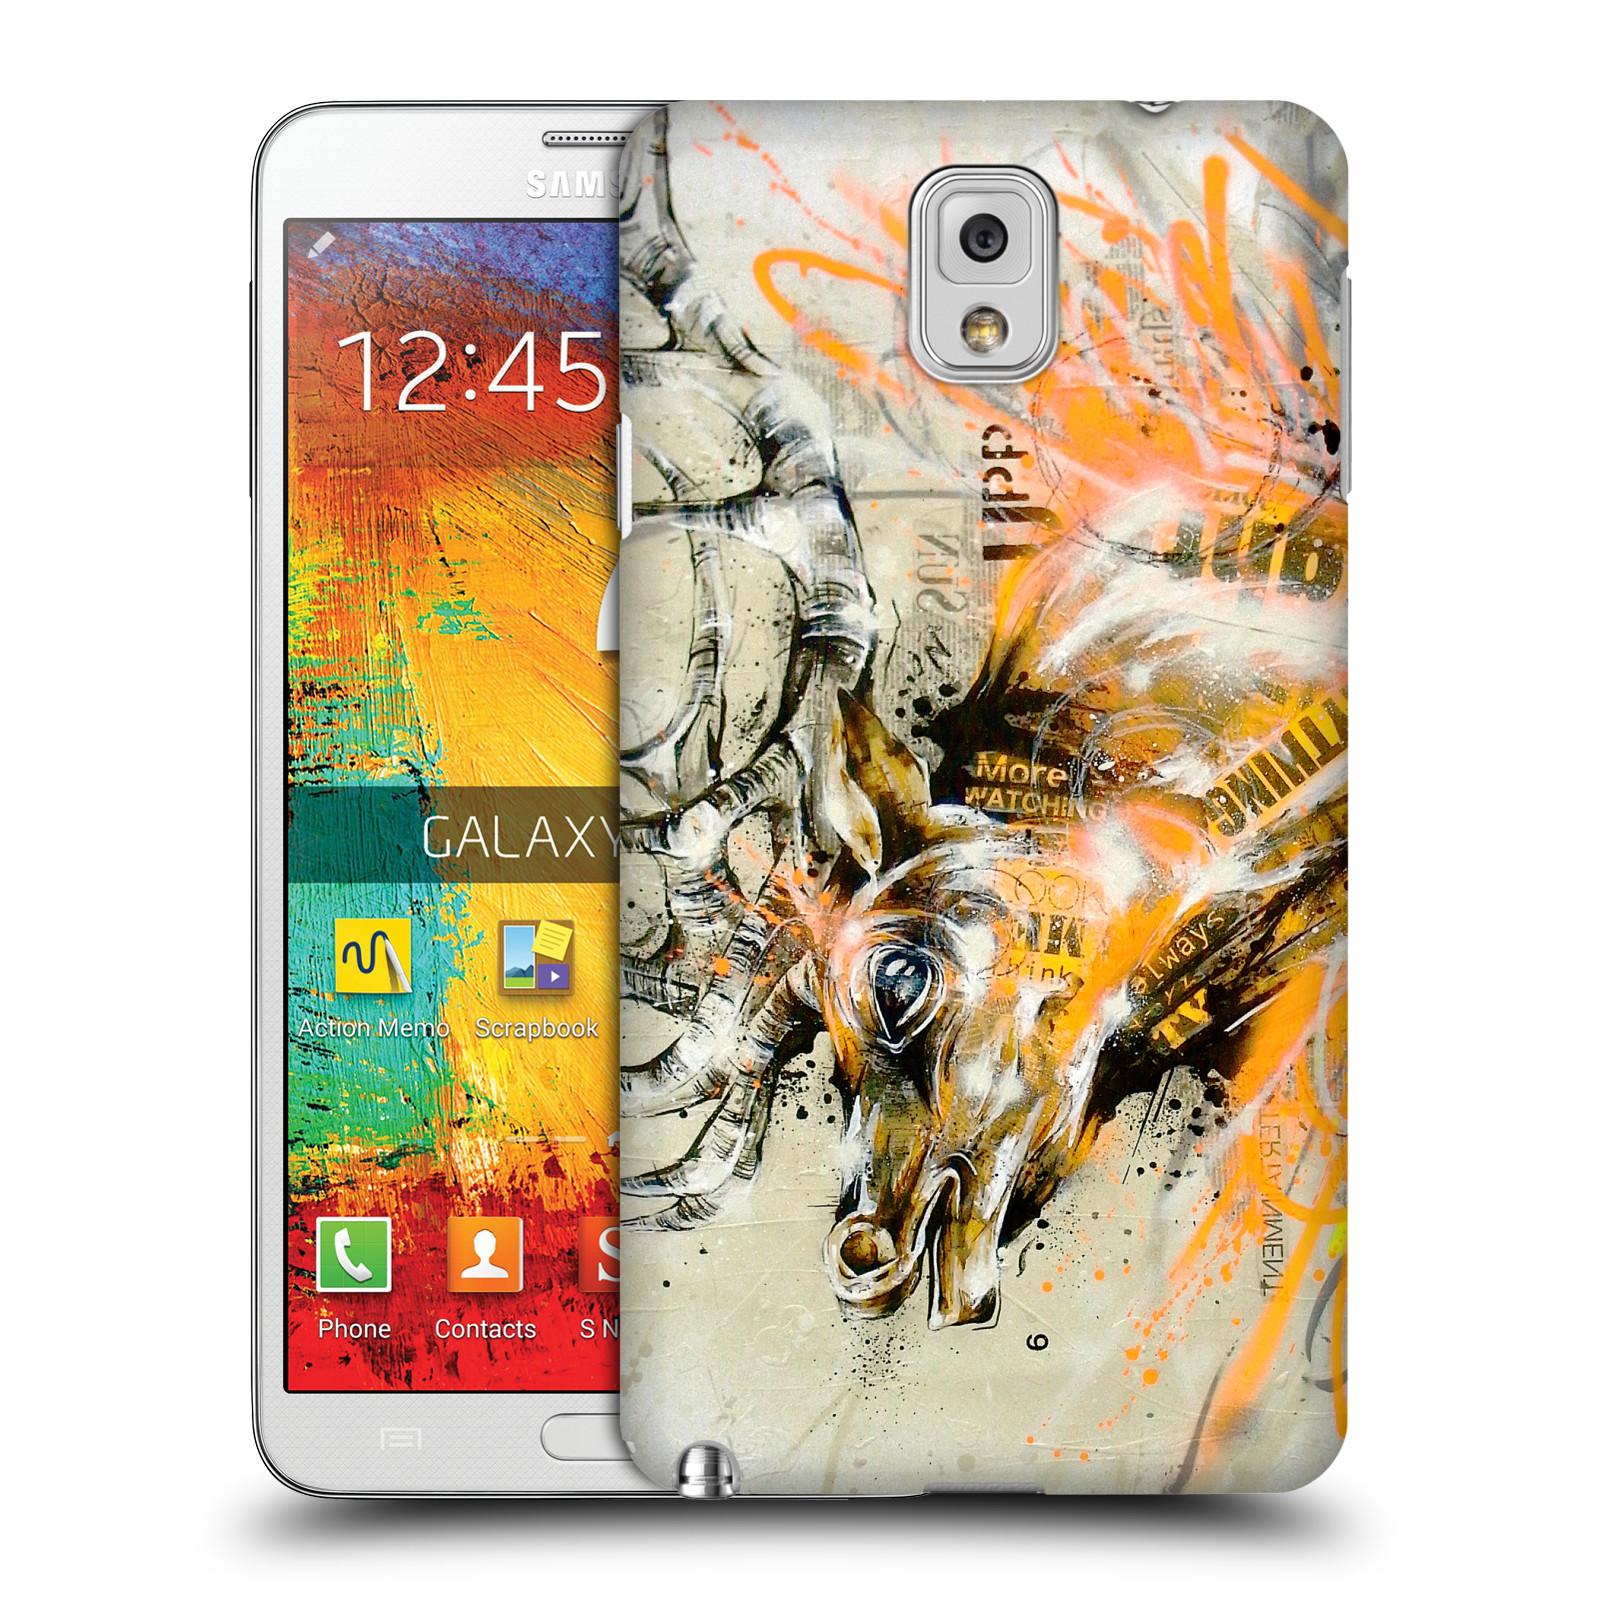 Oficial-Taka-sudo-Animales-Funda-Rigida-Posterior-Para-Telefonos-Samsung-2